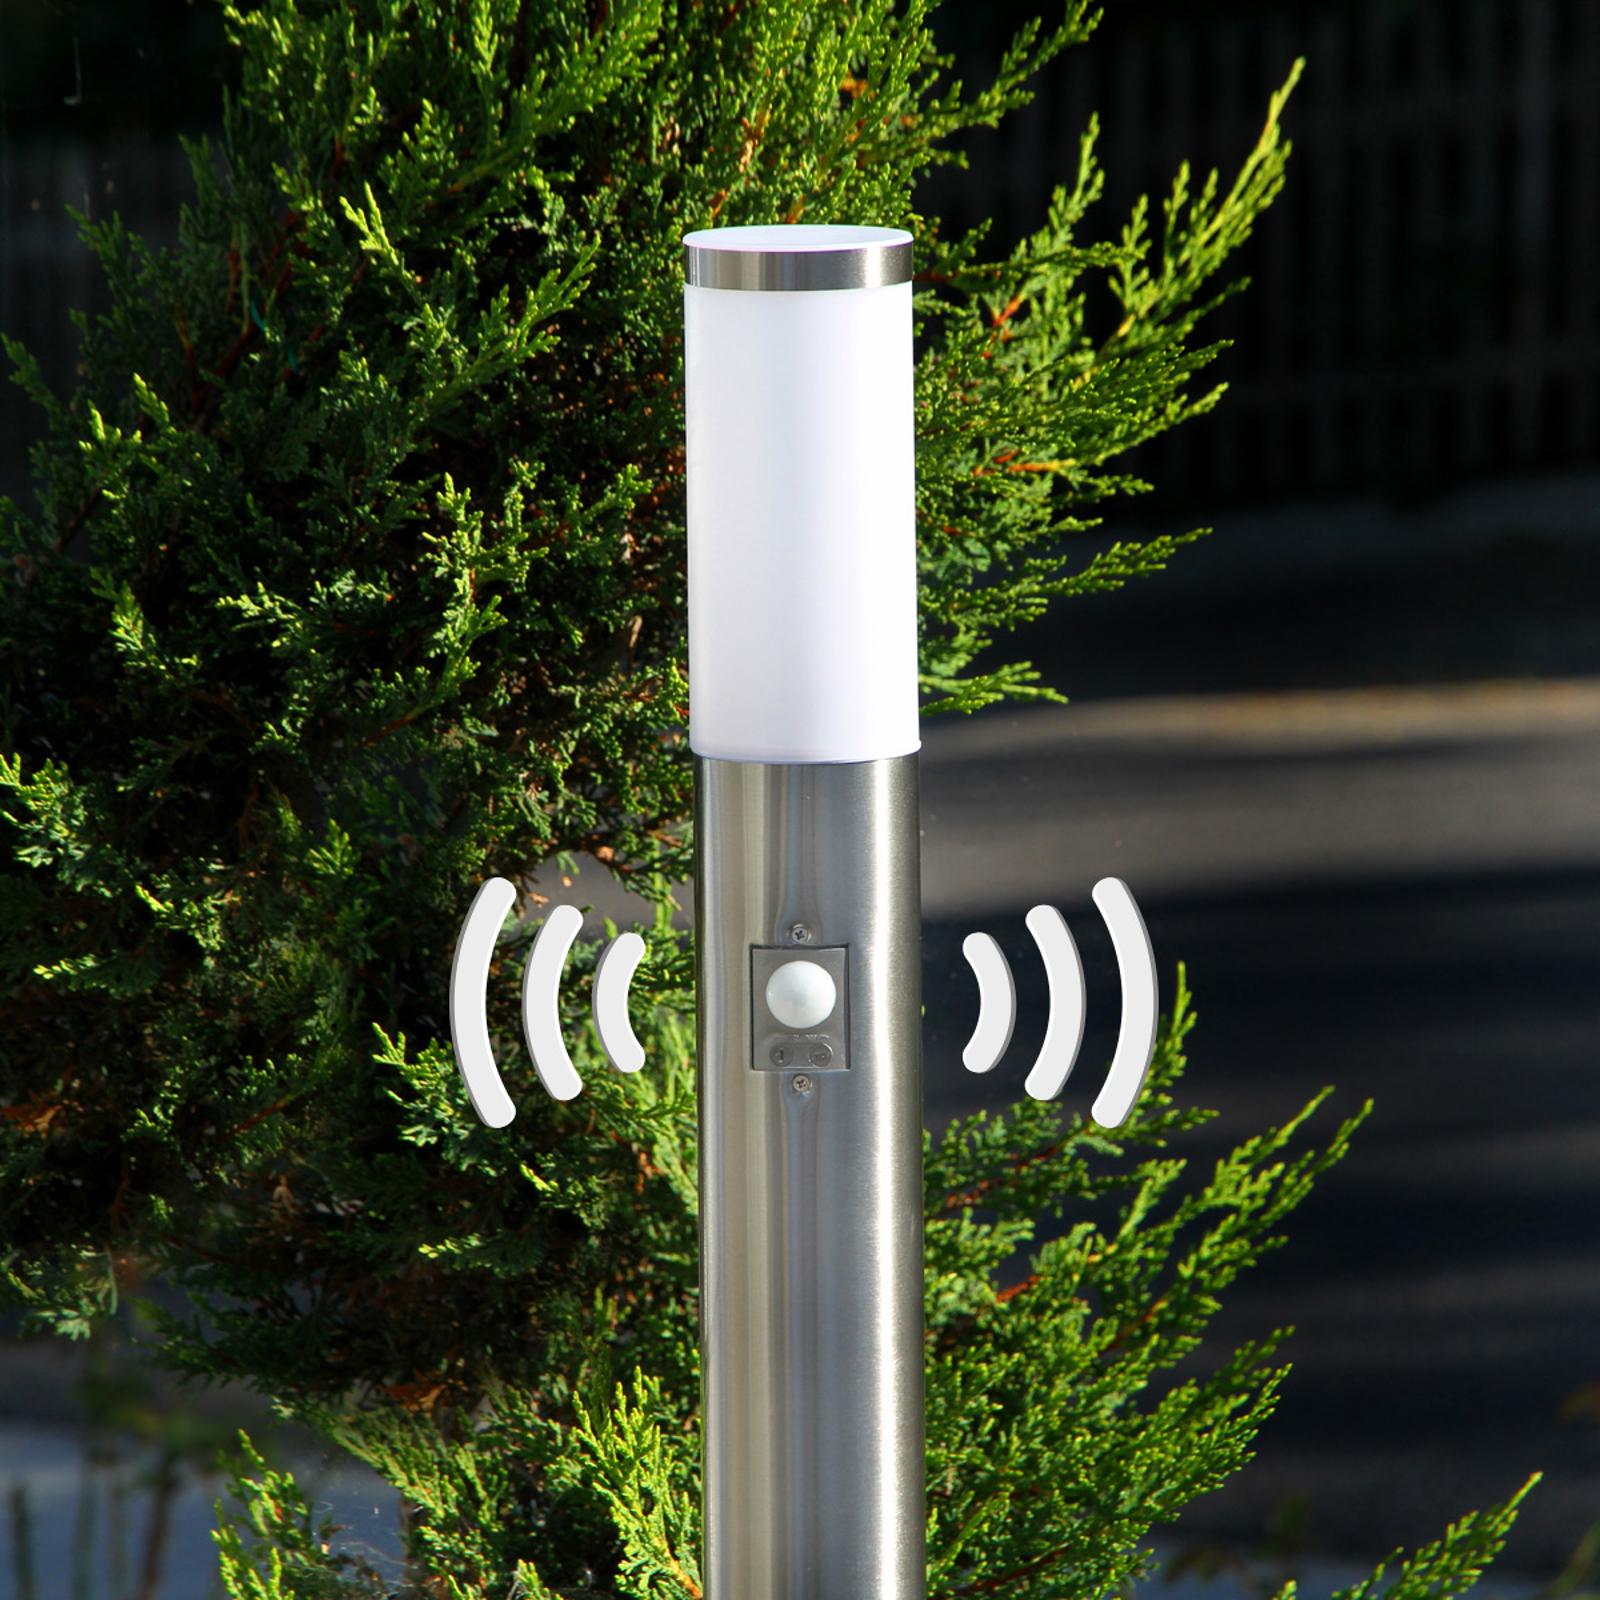 Kristof - sensor-veilys i edelstål